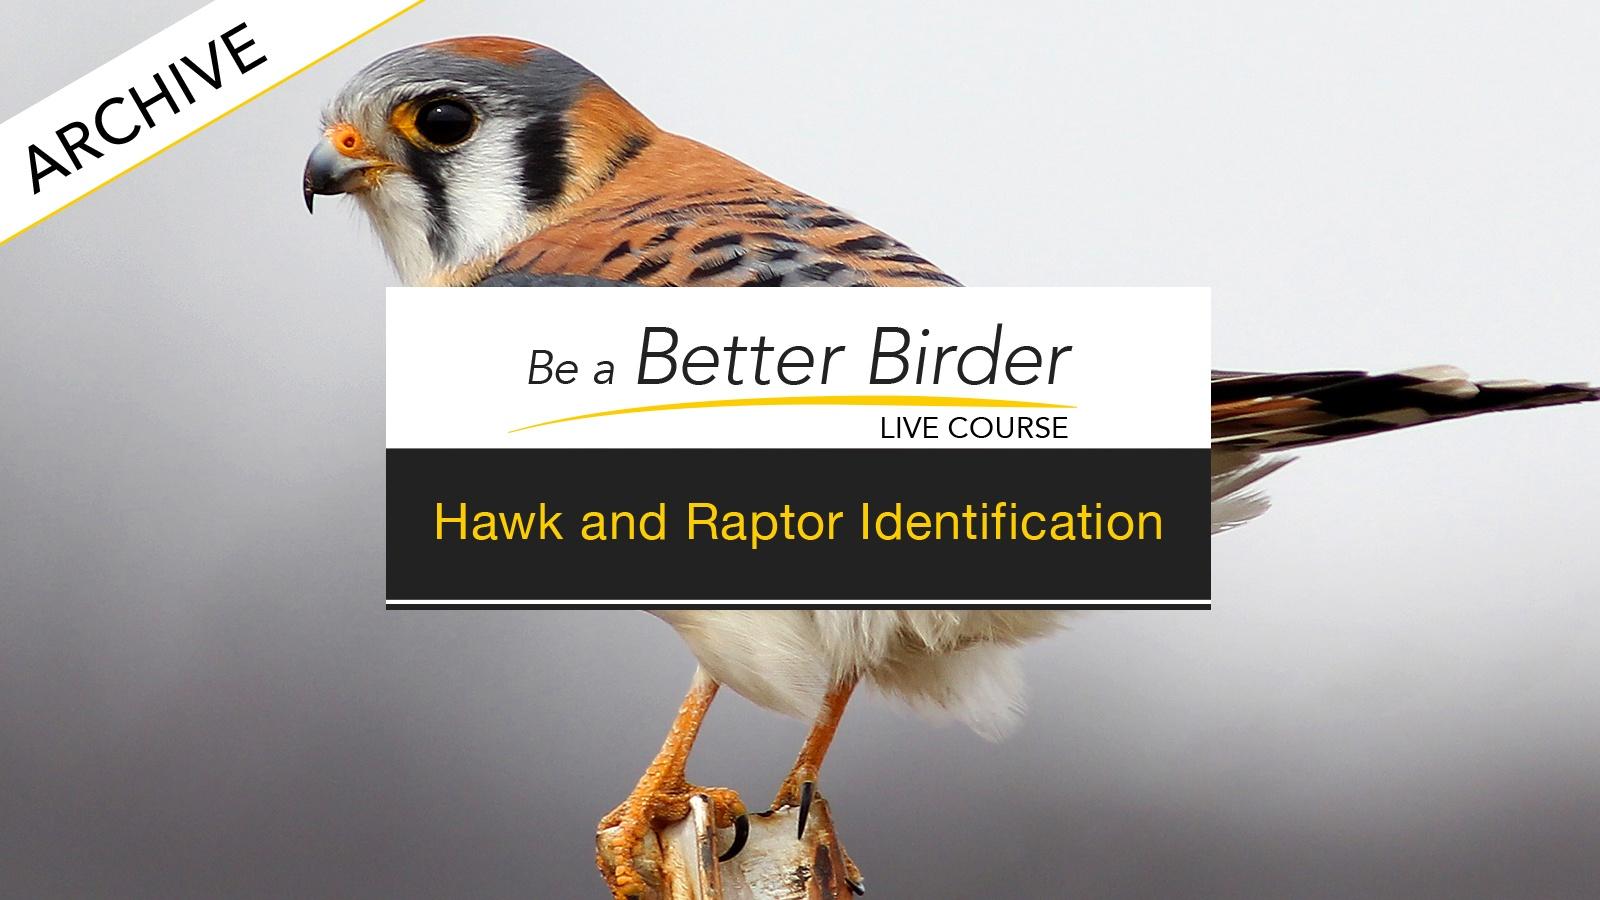 BirdAcademy-raptor-thumbnail-course 2.jpg